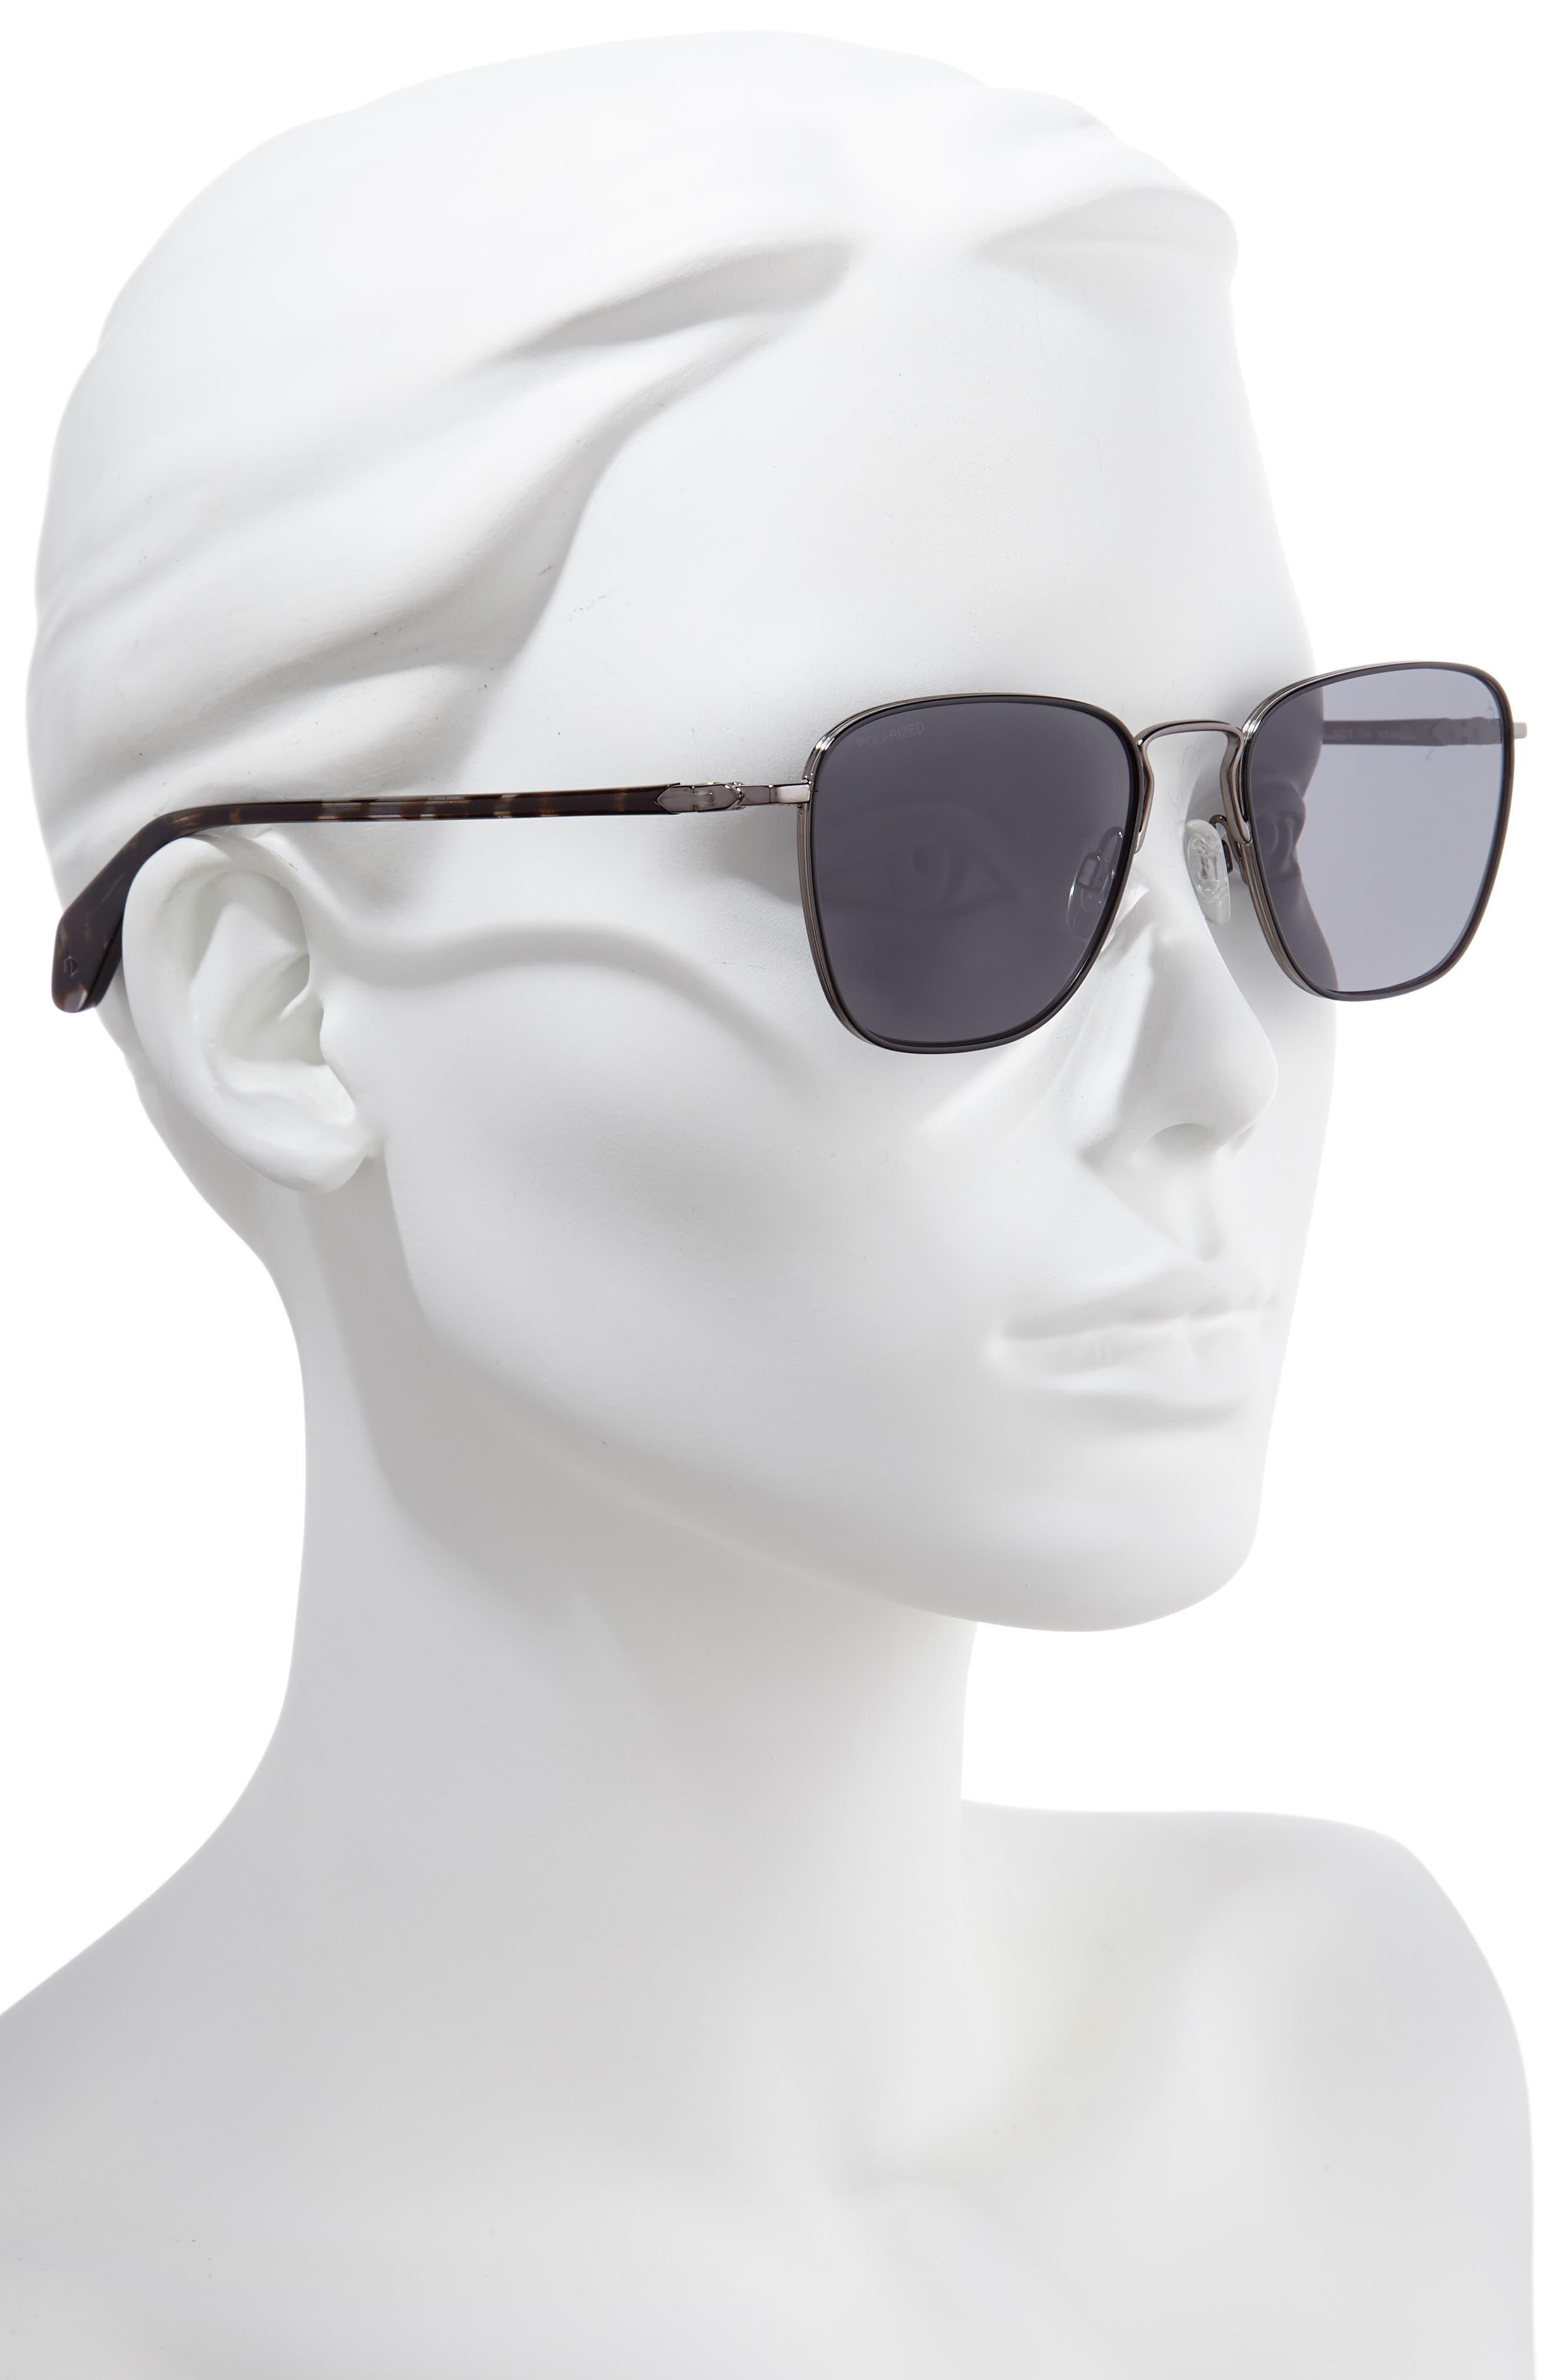 54mm Polarized Aviator Sunglasses,                             Alternate thumbnail 2, color,                             DARK RUTHENIUM/ BLACK